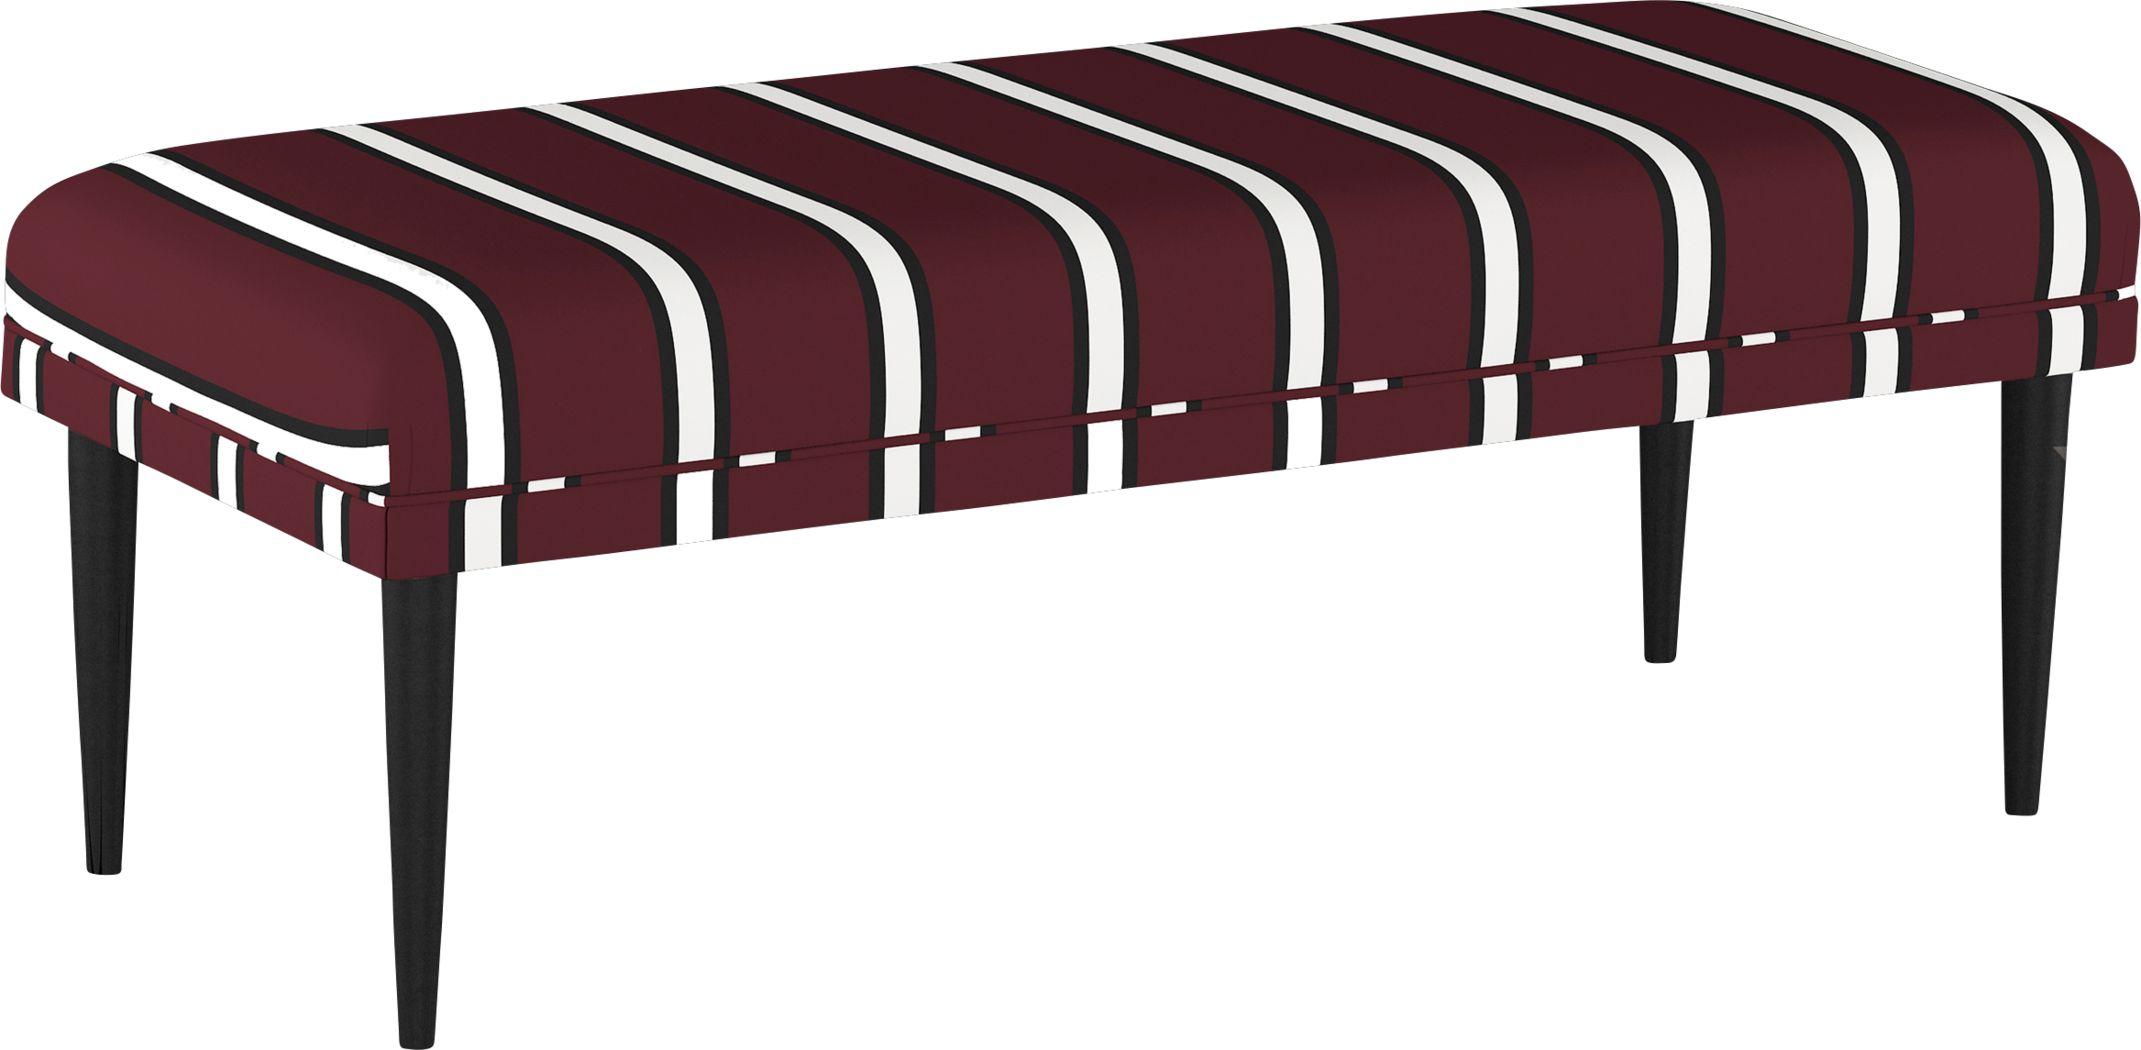 Avonte Brown Accent Bench